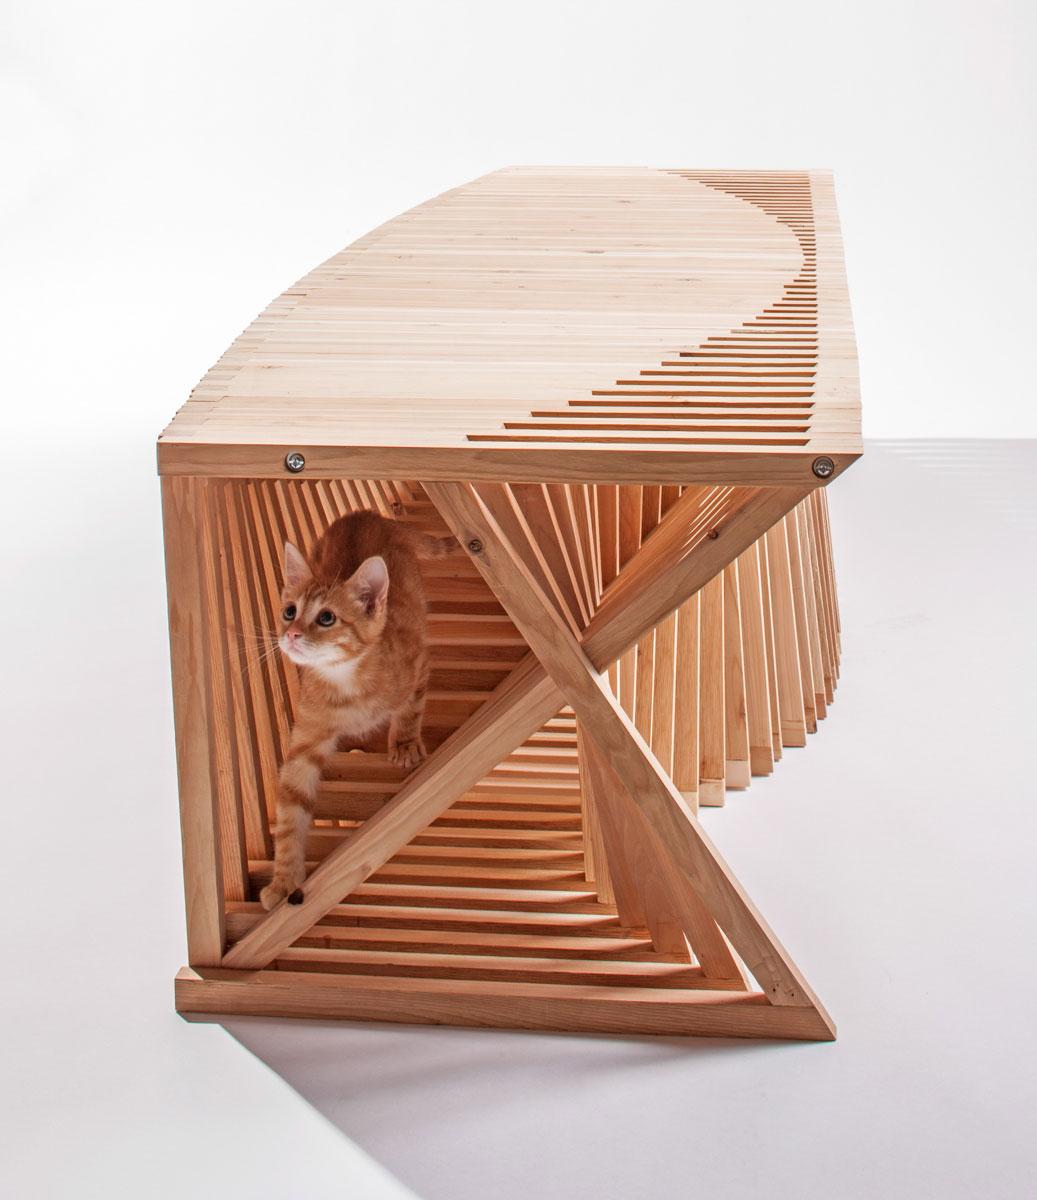 Product design architecture for pets yellowtrace - Casas para gatos baratas ...